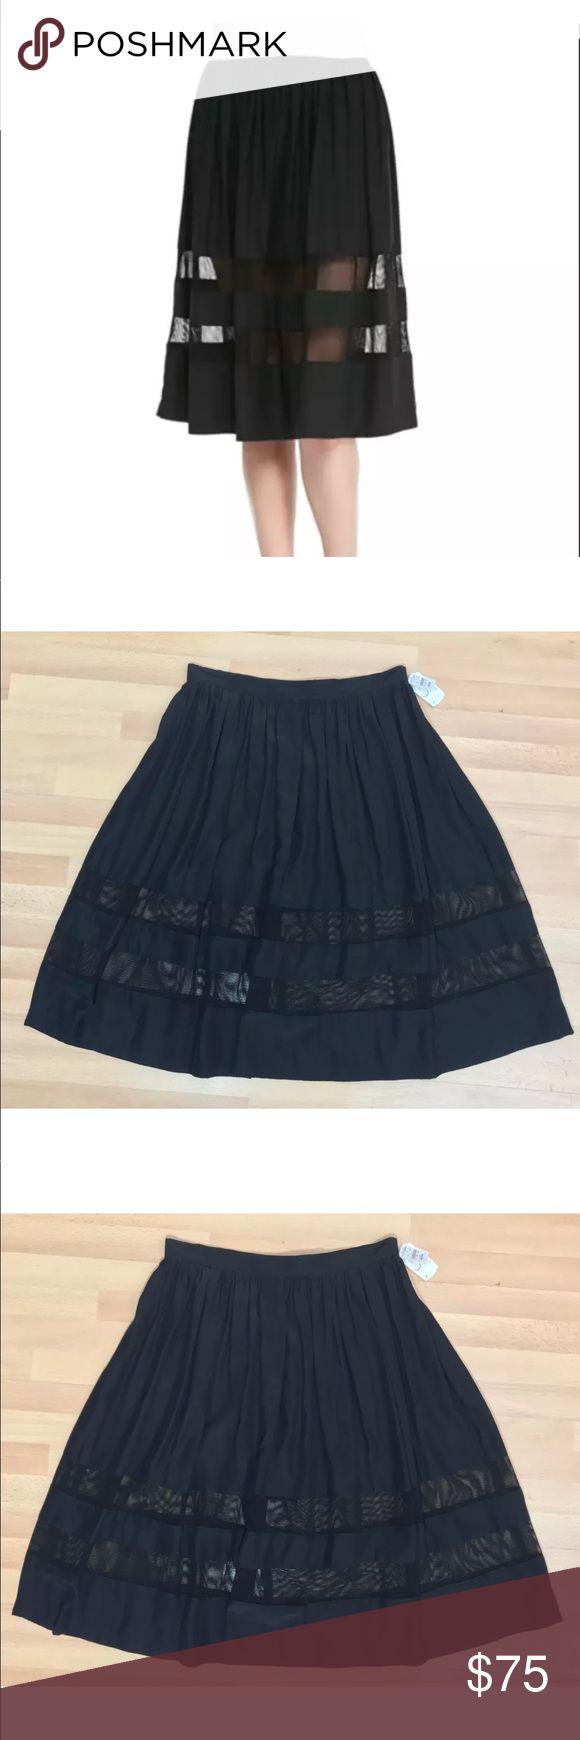 "Amanda Uprichard loves cusp skirt nwt Amanda Uprichard Loves Cusp. From Neiman Marcus Gathered Mesh Inset A-Line Skirt, Black Side zipper Size Medium 100% silk Mesh is spandex/nylon blend New with tags Top pleats subtly ruffle skirt. A-line silhouette. Mesh insets create a peekaboo effect.  Measurements (Flat/unstretched) Waist  29""  Length 25.5"" Amanda Uprichard Skirts A-Line or Full"